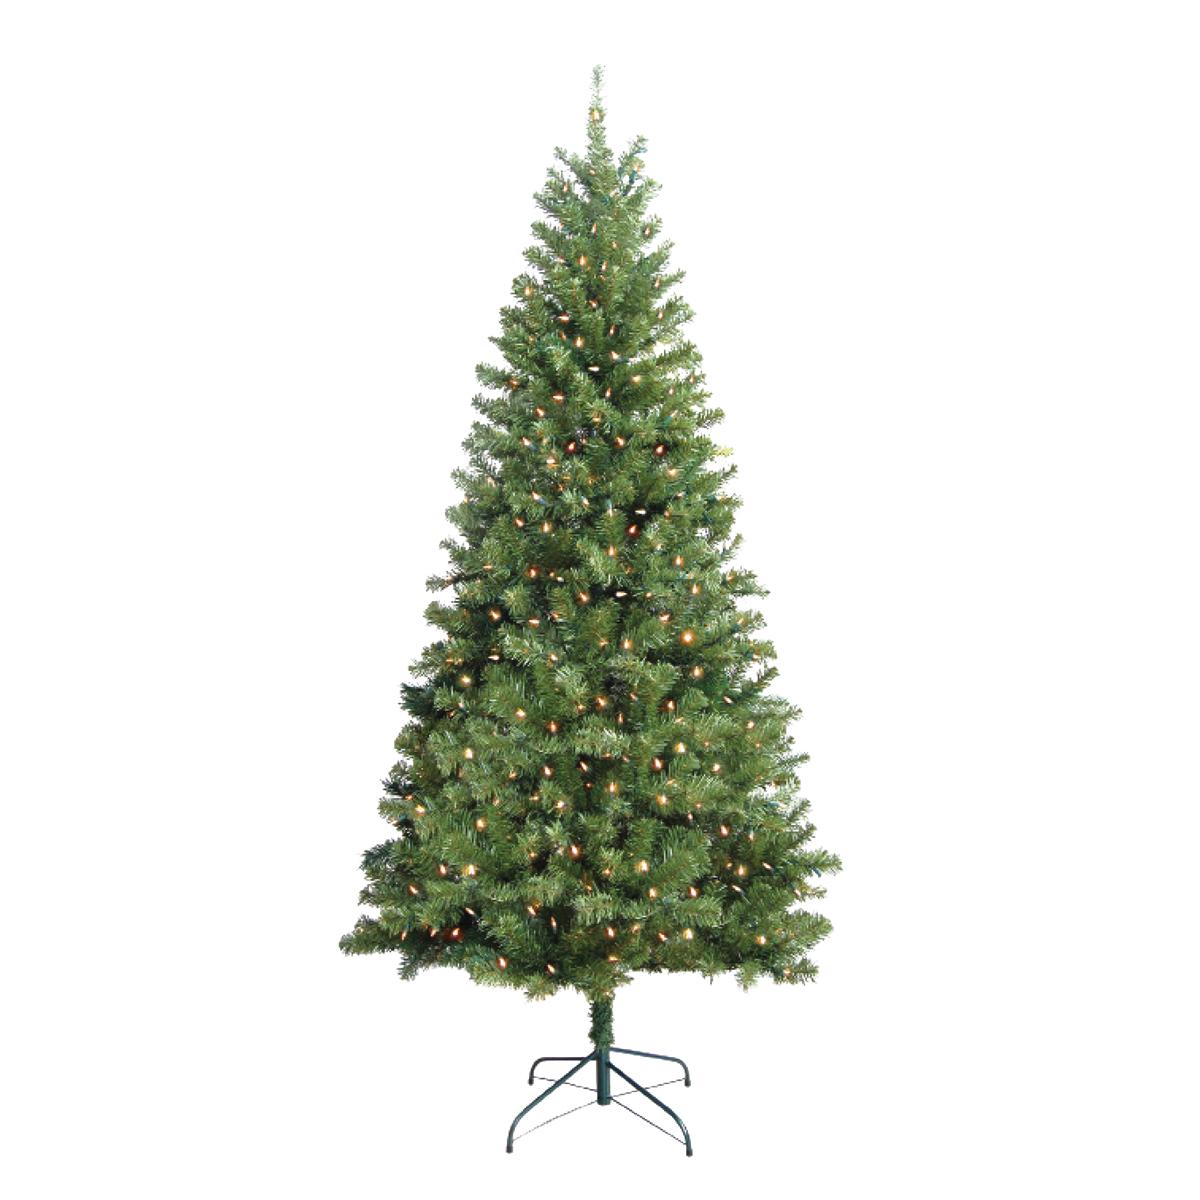 Picture of Santas Forest 10770 Christmas Tree, 7 ft H, Douglas Family, 110 V, Mini Bulb, Clear Light